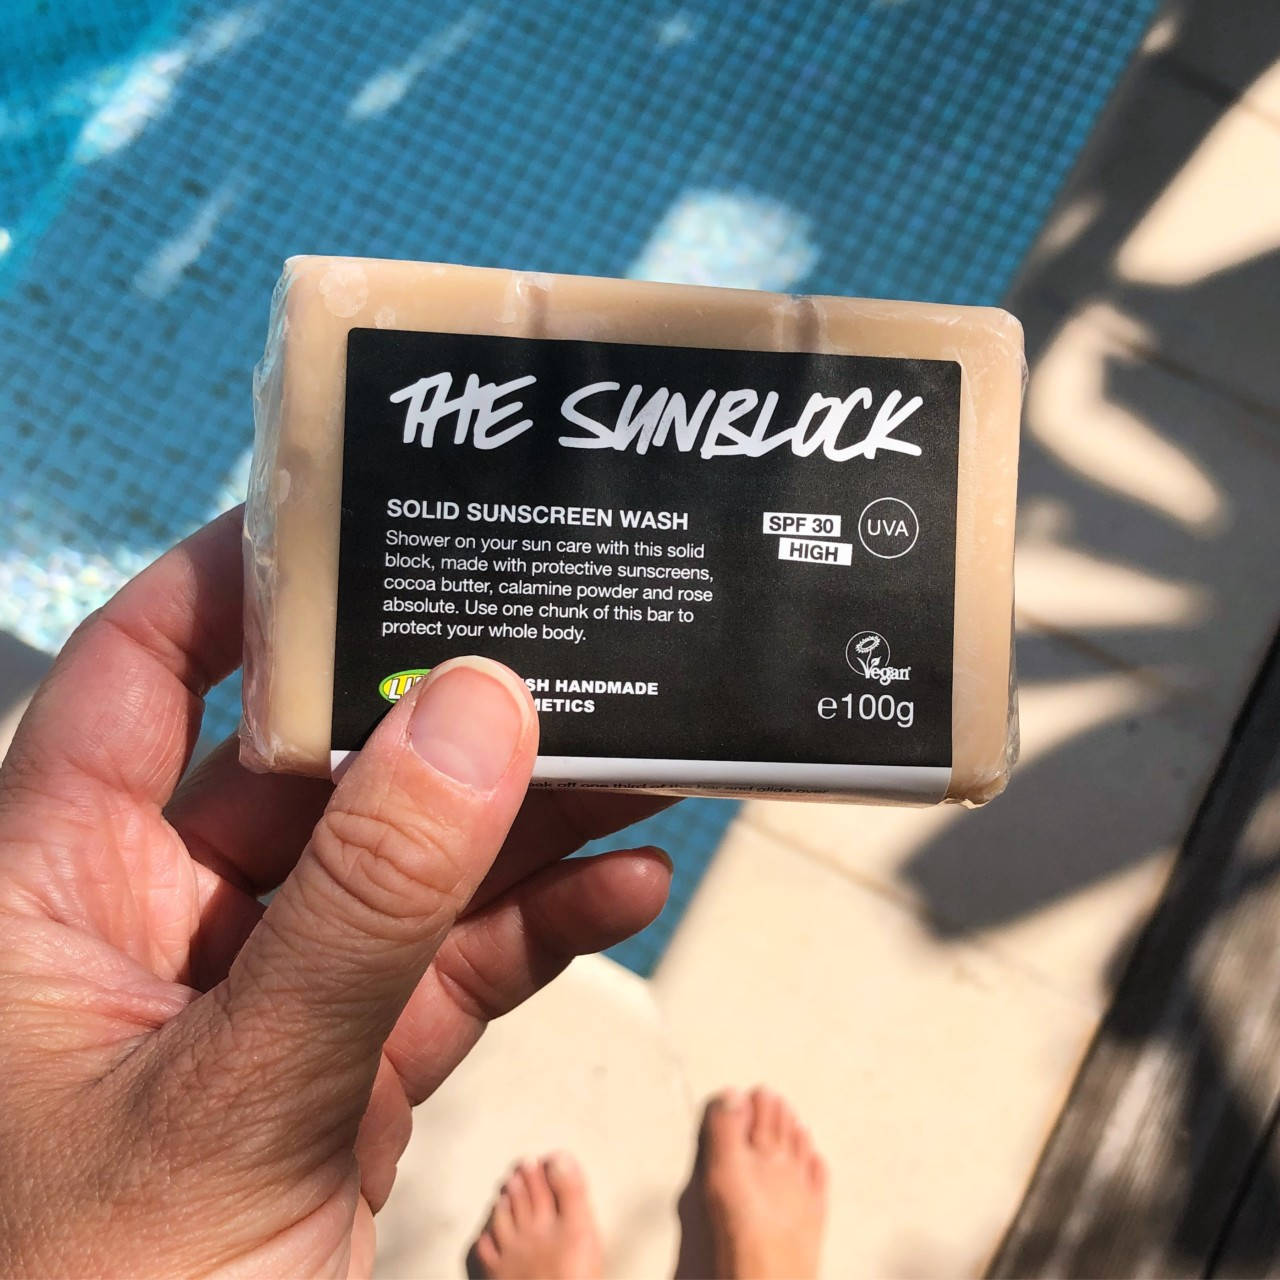 lush-sunblock-handmade-fresh-cosmetics-solkrem-zero-waste